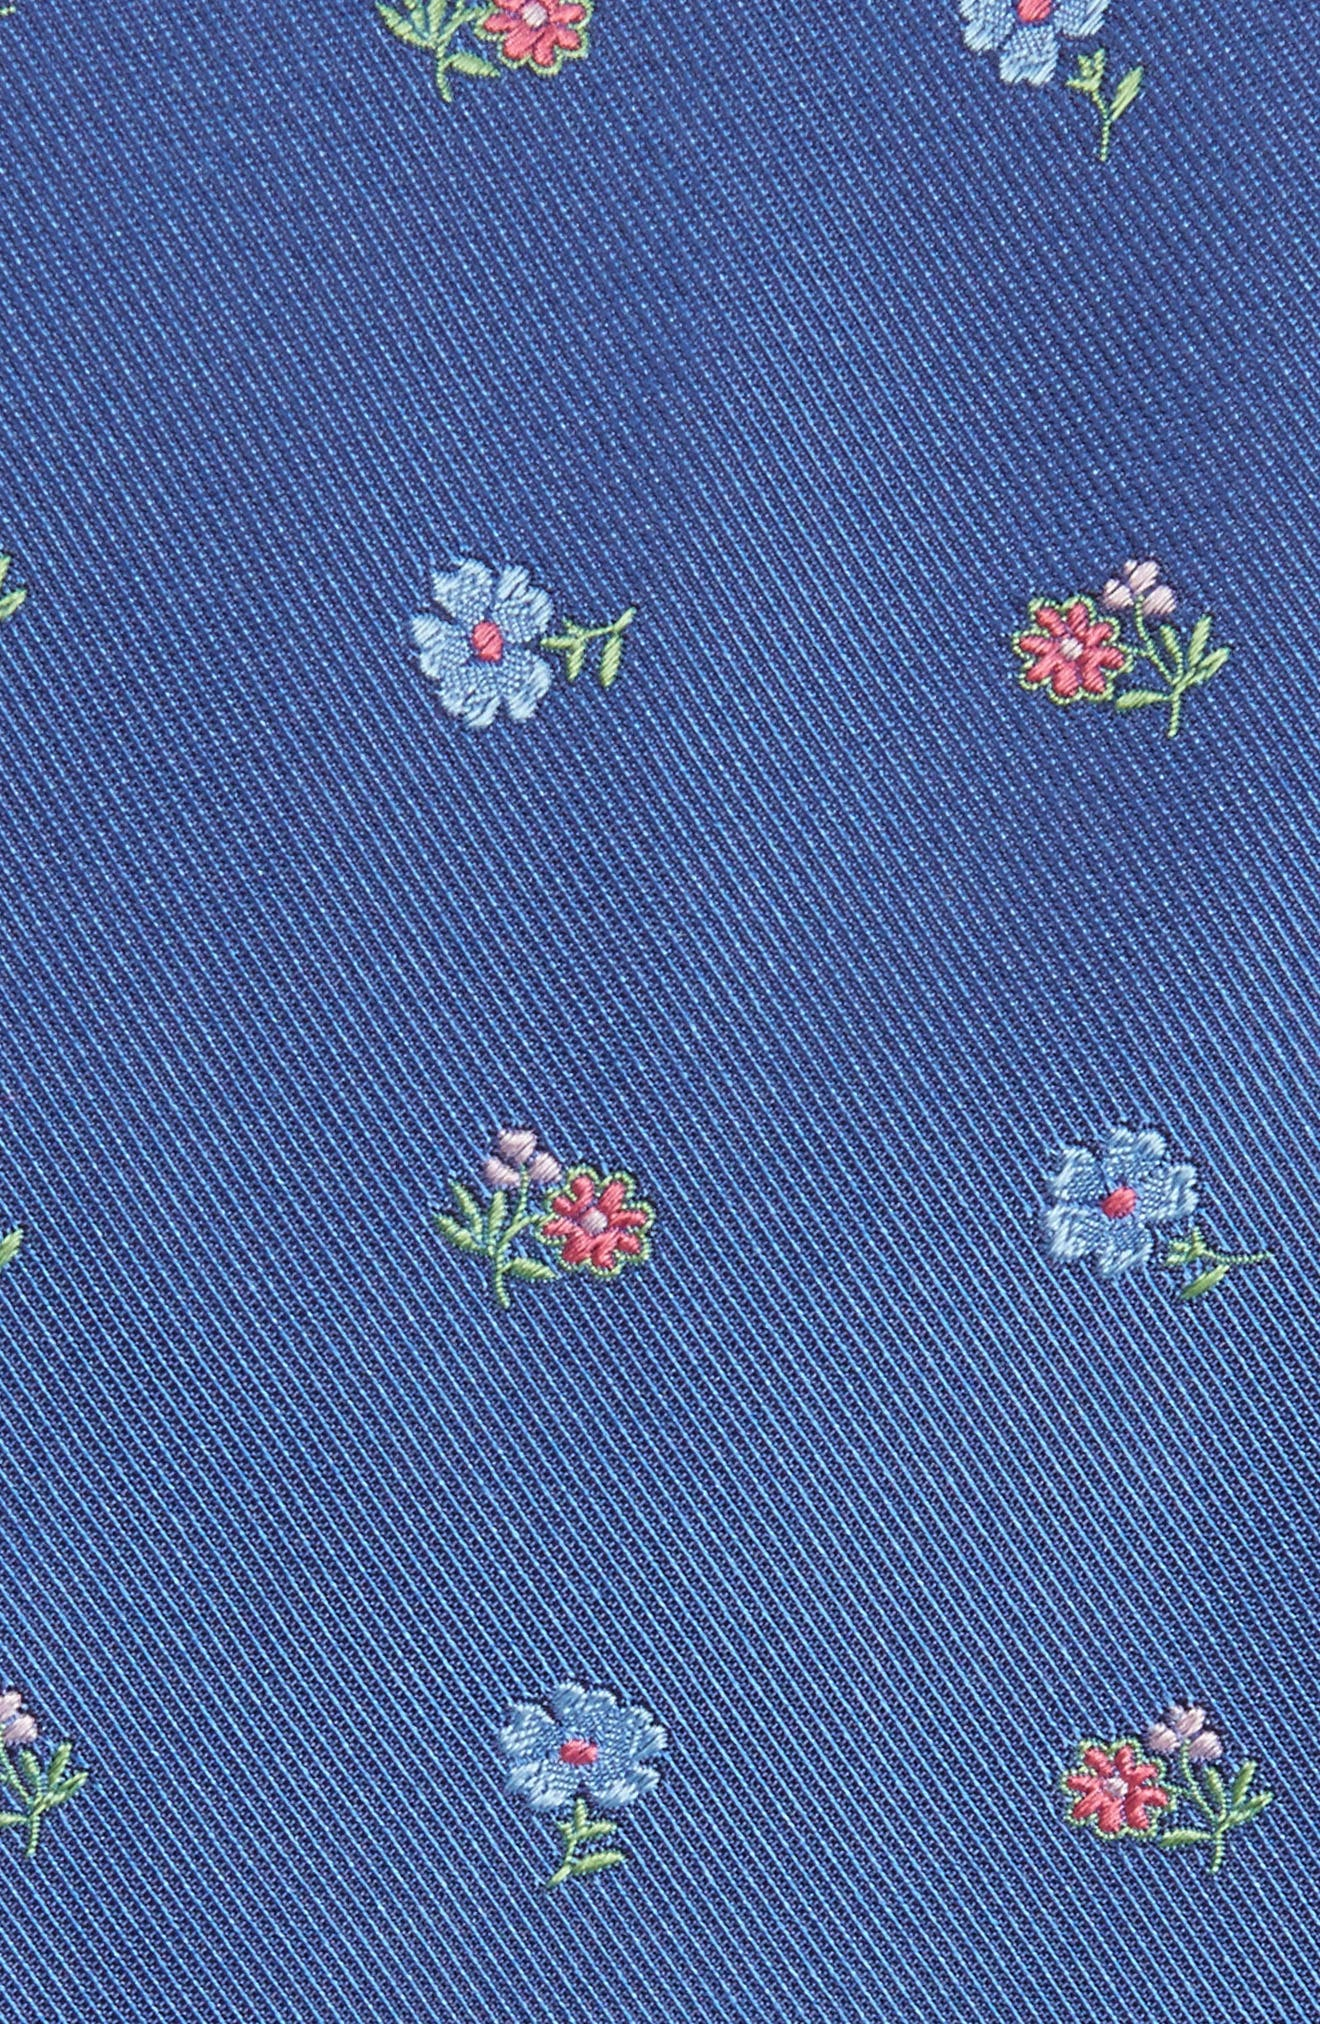 Floral Jacquard Silk Tie,                             Alternate thumbnail 2, color,                             Dark Blue